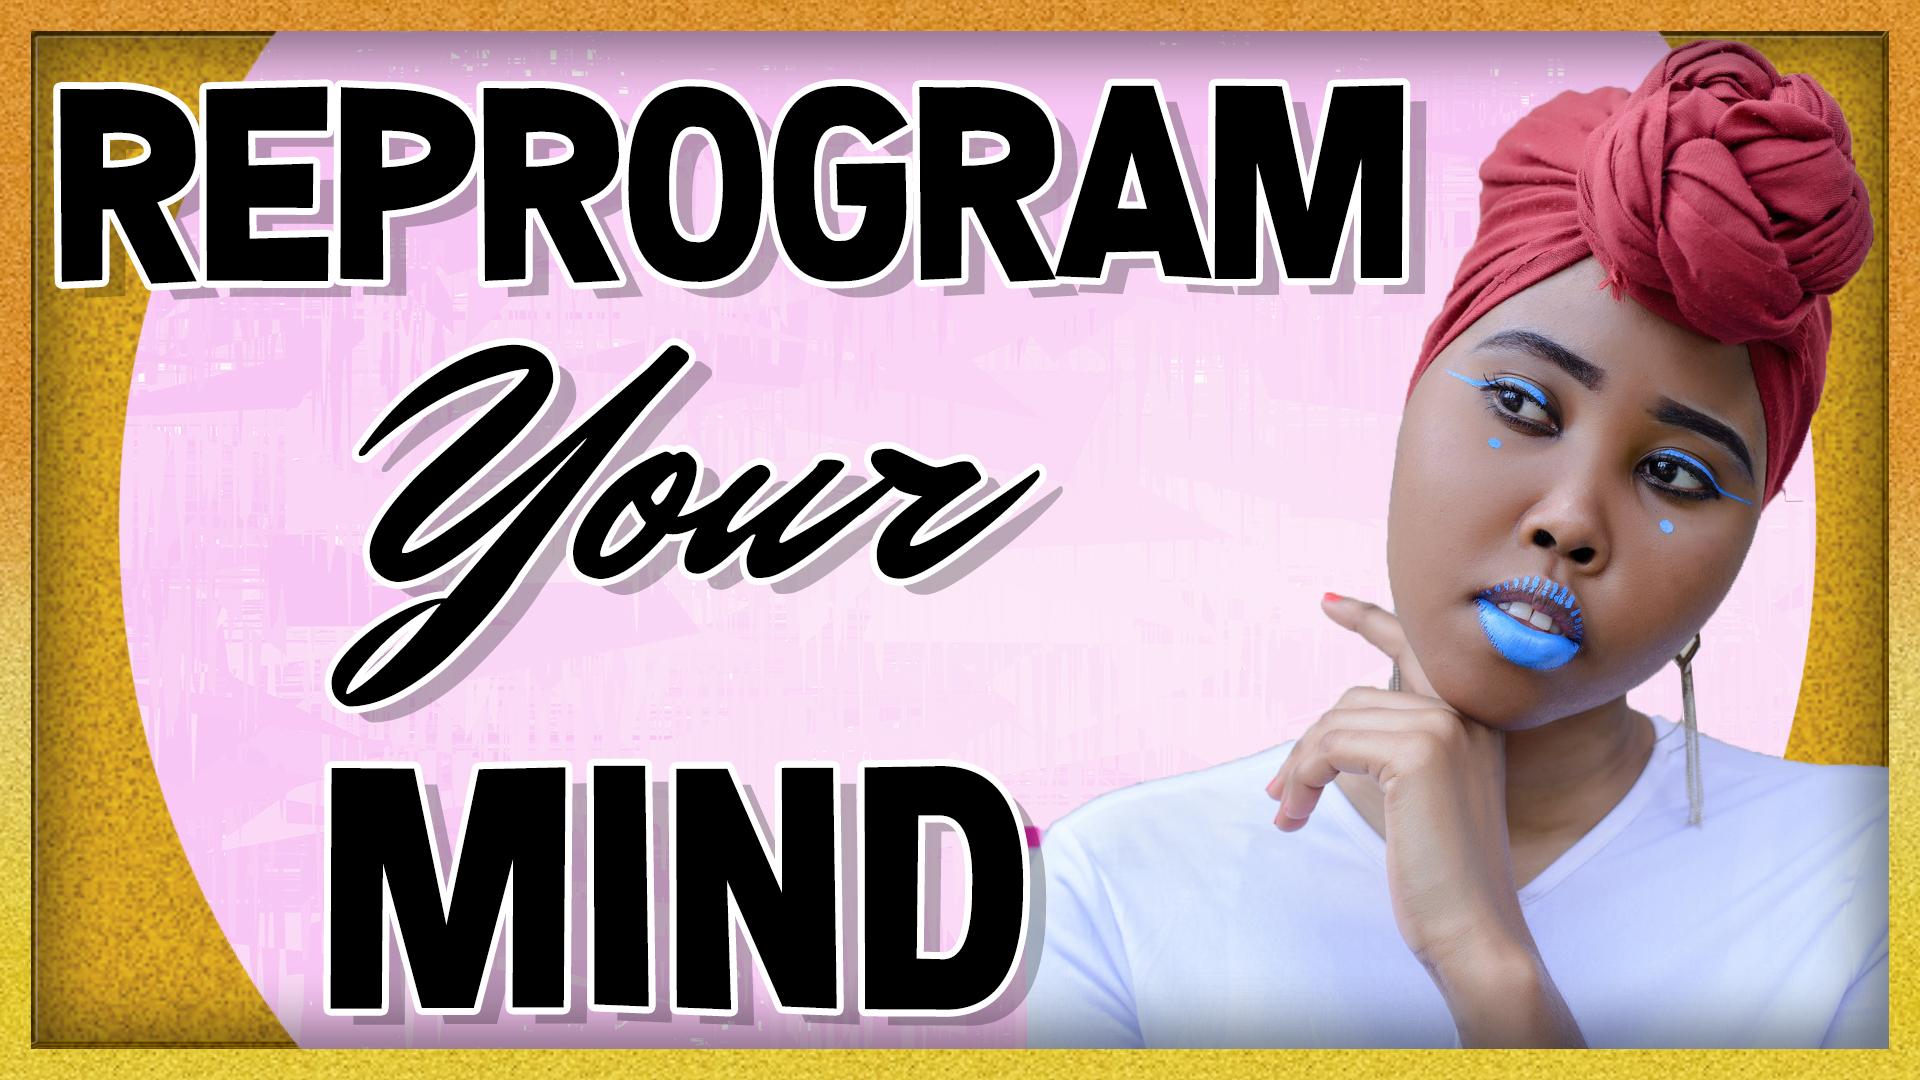 Reprogram Your Subconscious Mind for a Success Mindset (Stop Self-Sabotage!)